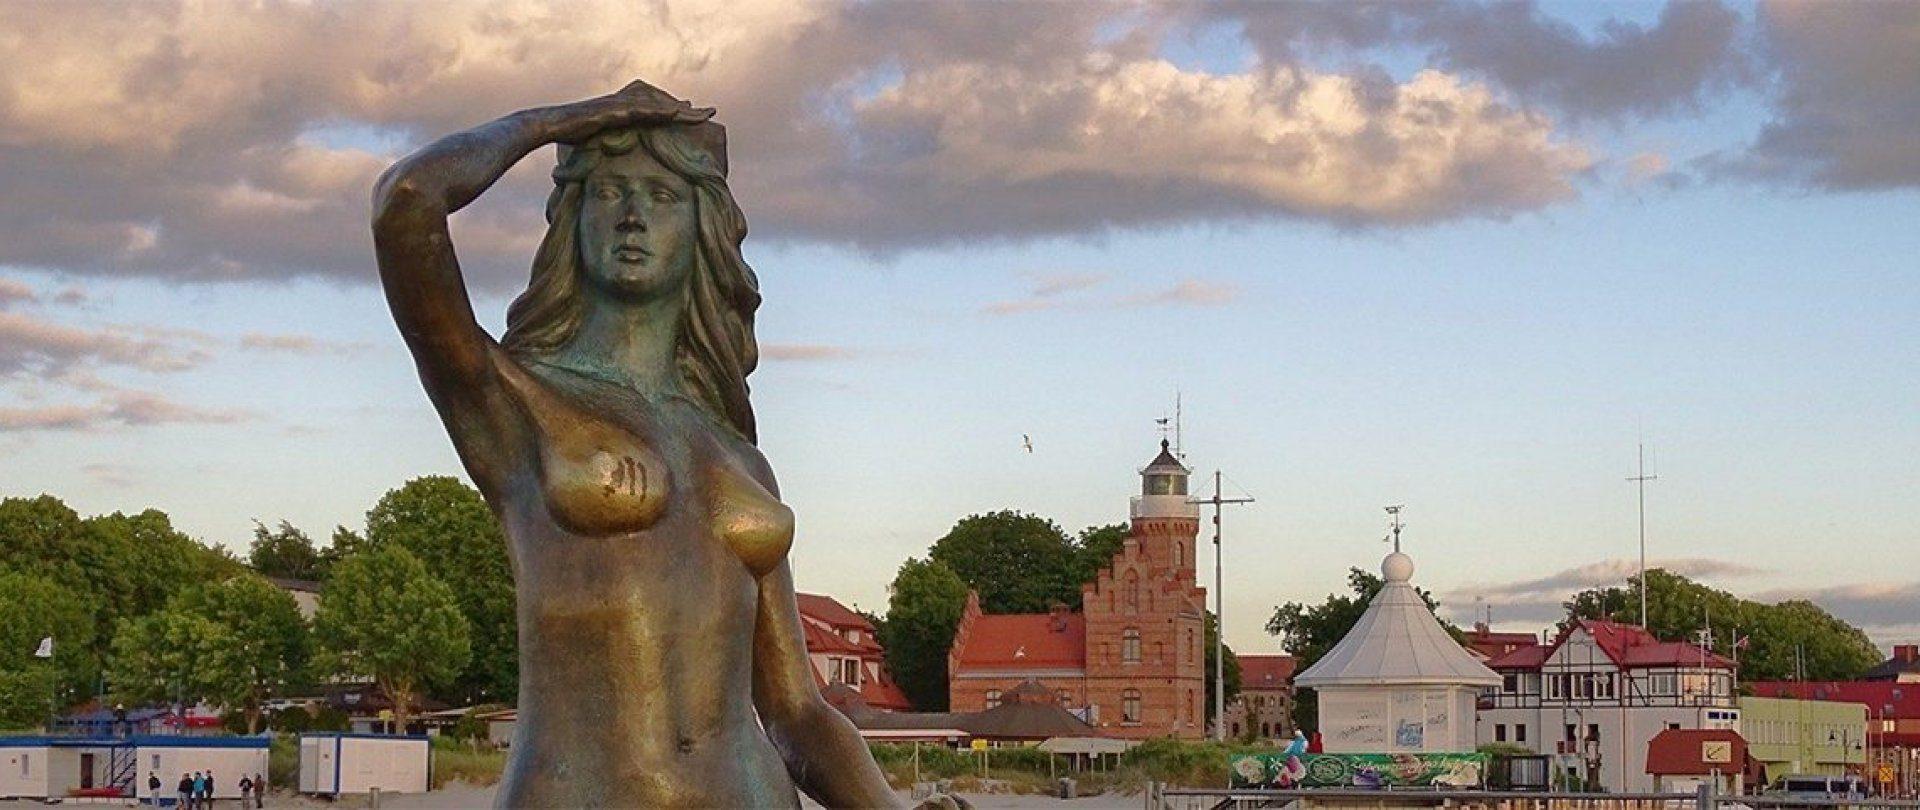 Meerjungfrau aus Ustka